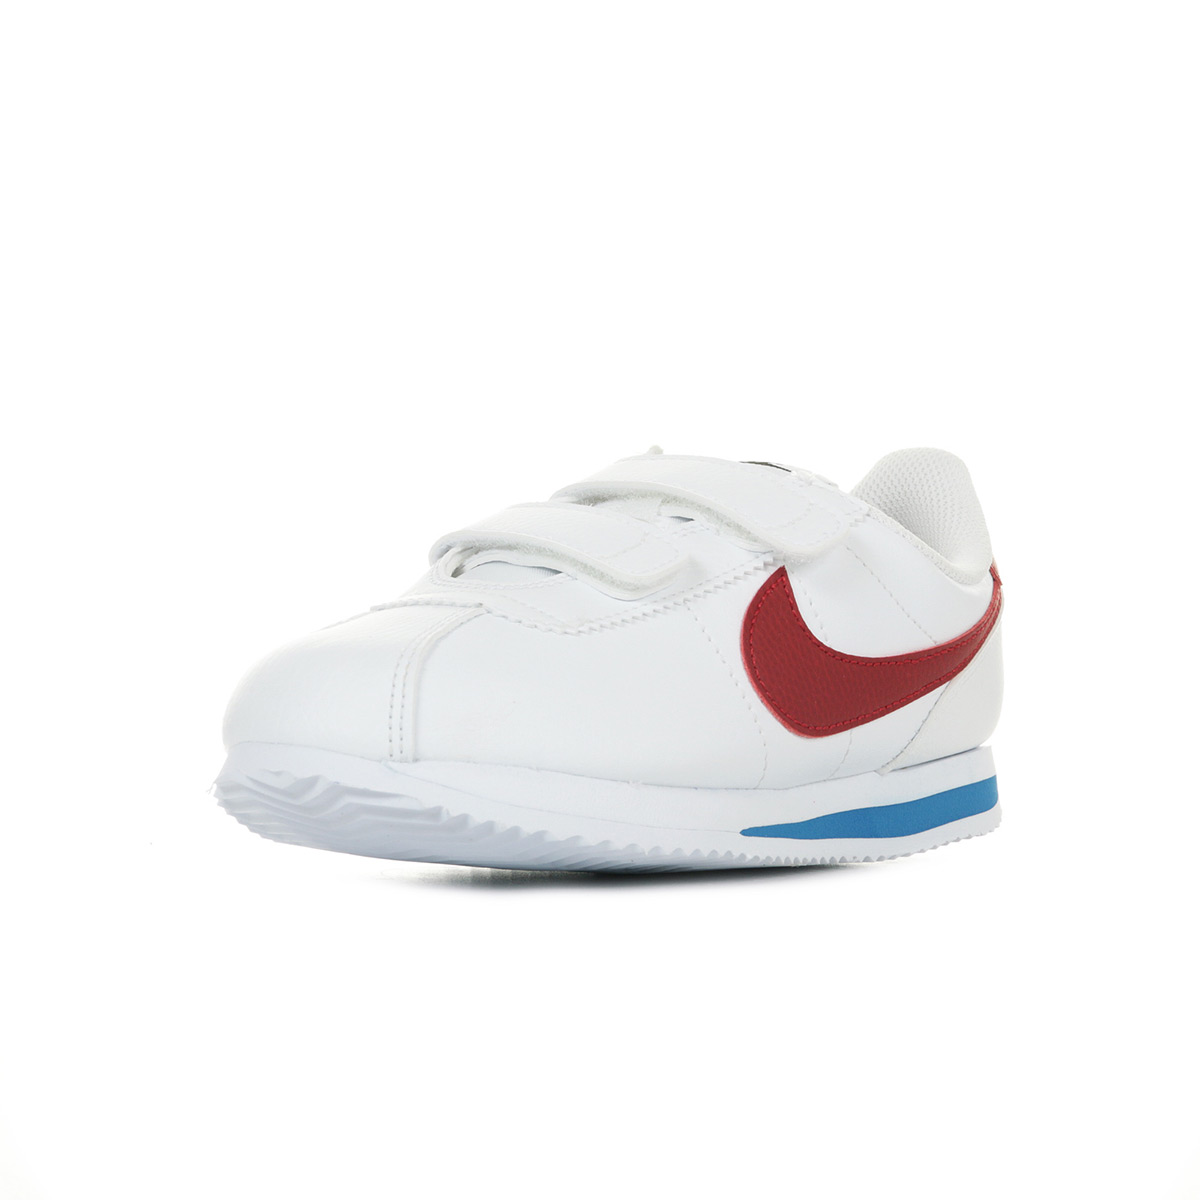 low priced e4a9f d6154 Nike Cortez Basic SL (PSV) ...